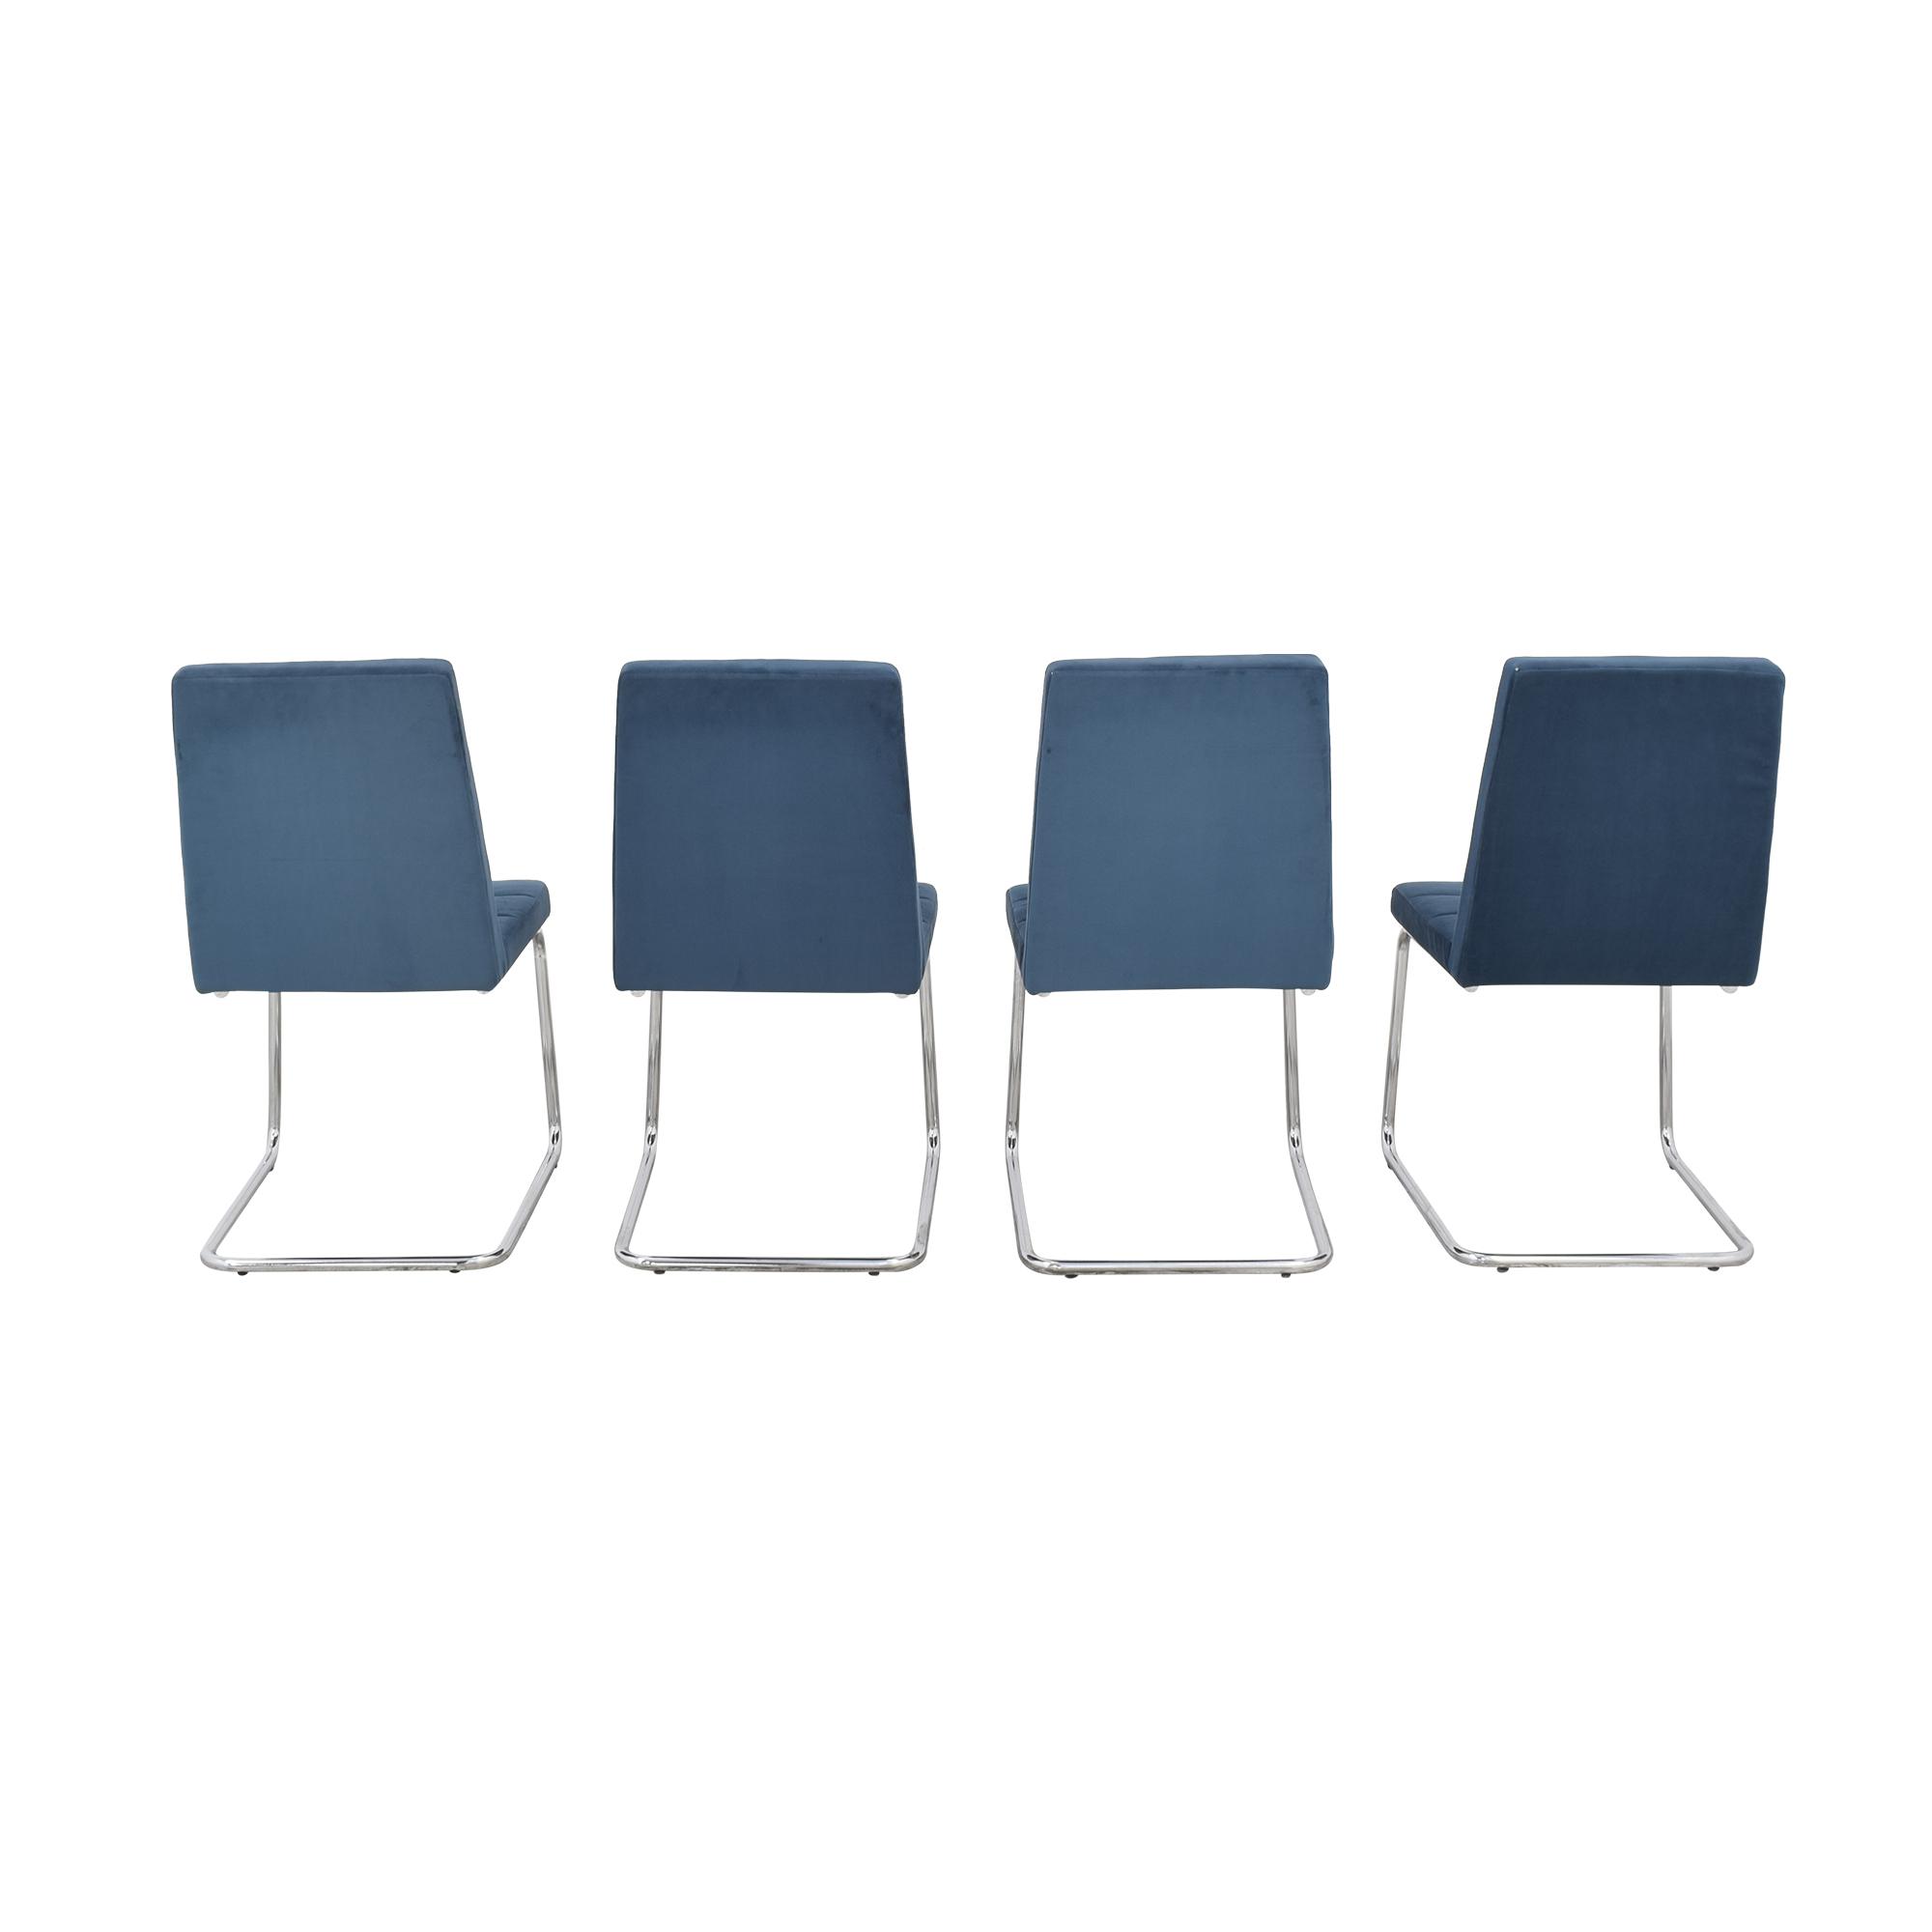 CB2 CB2 Roya Chairs Slate Blue coupon